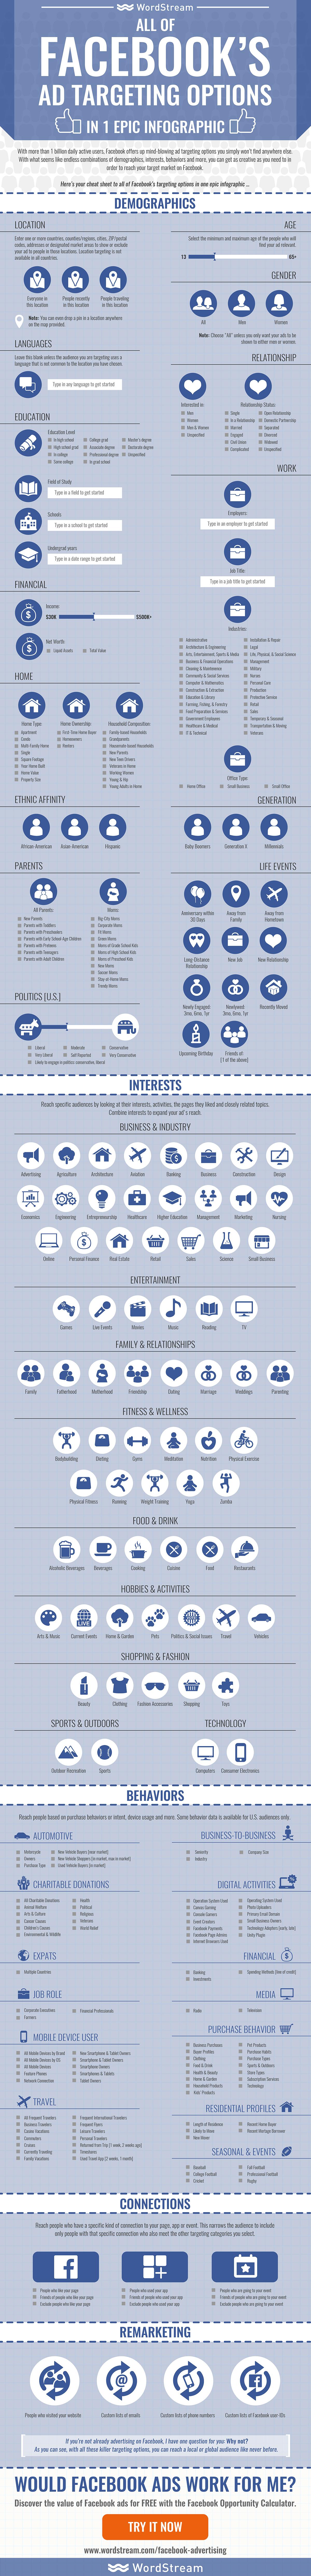 facebook-ad-targeting-options-infographic-wordstream-large.jpg